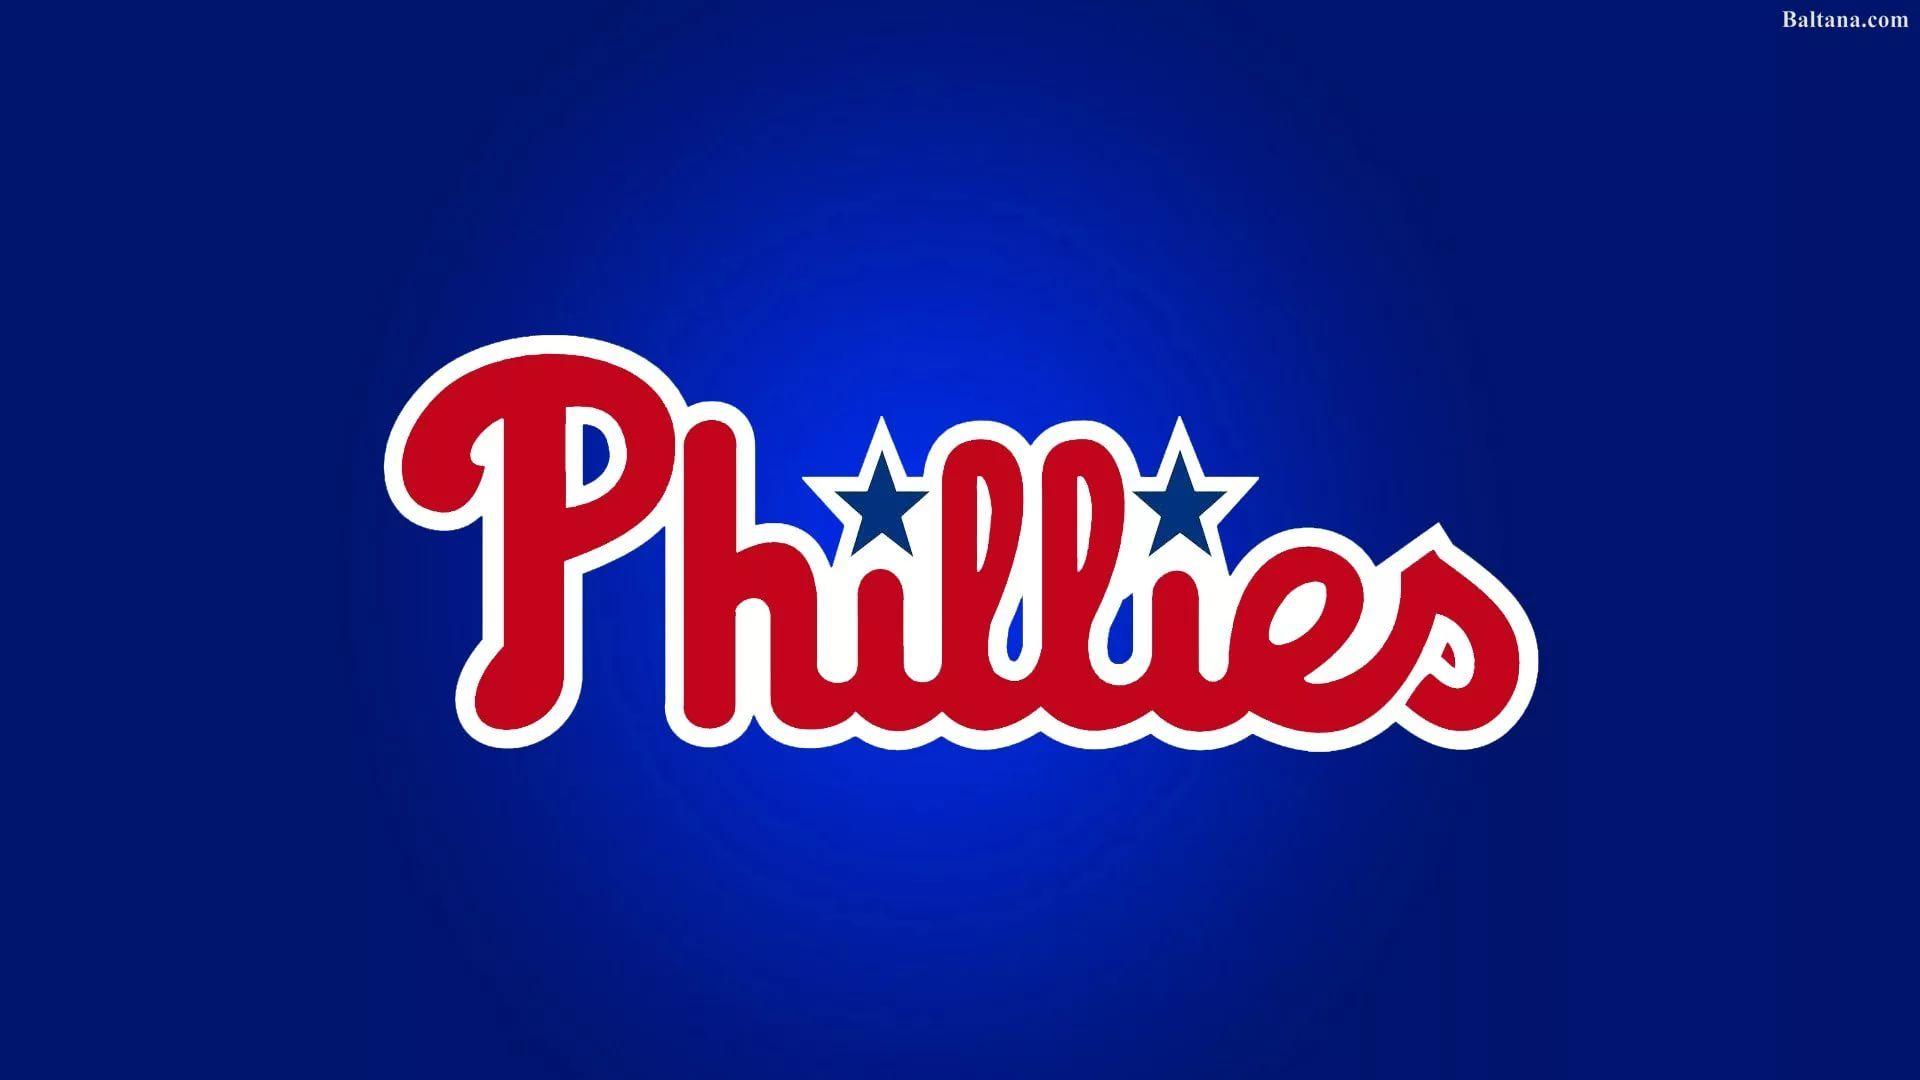 Phillies Logo hd wallpaper 1080p for pc